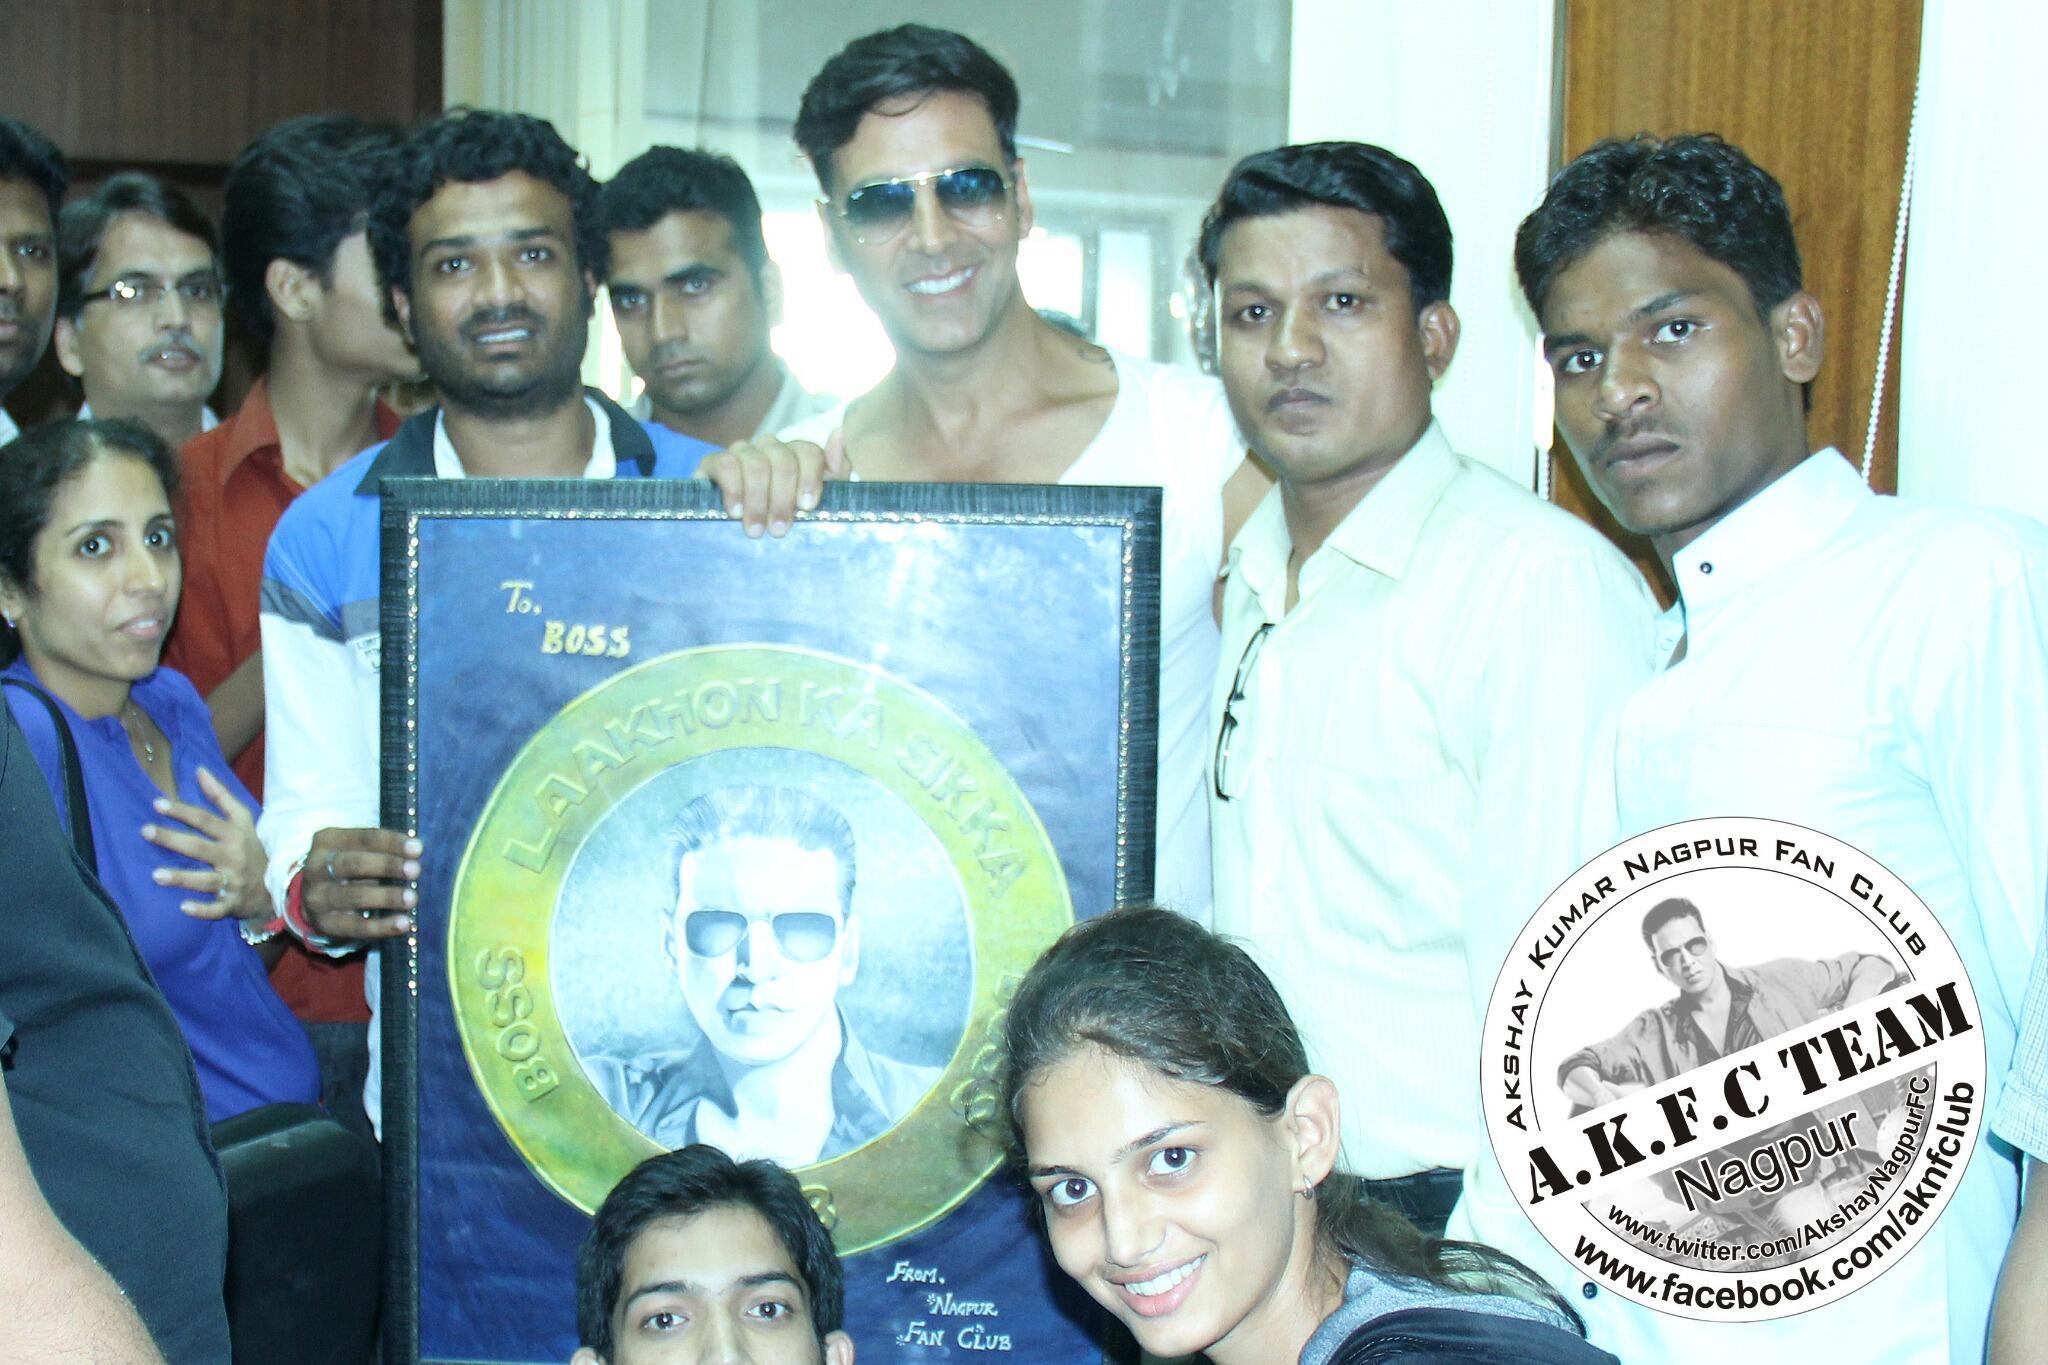 RT @AkshayNagpurFC: A Pleasure meeting with @akshaykumar Sir Again at Nagpur.We gifted a LAKHON KA SIKKA (Potrait) & sir liked it> http://t…